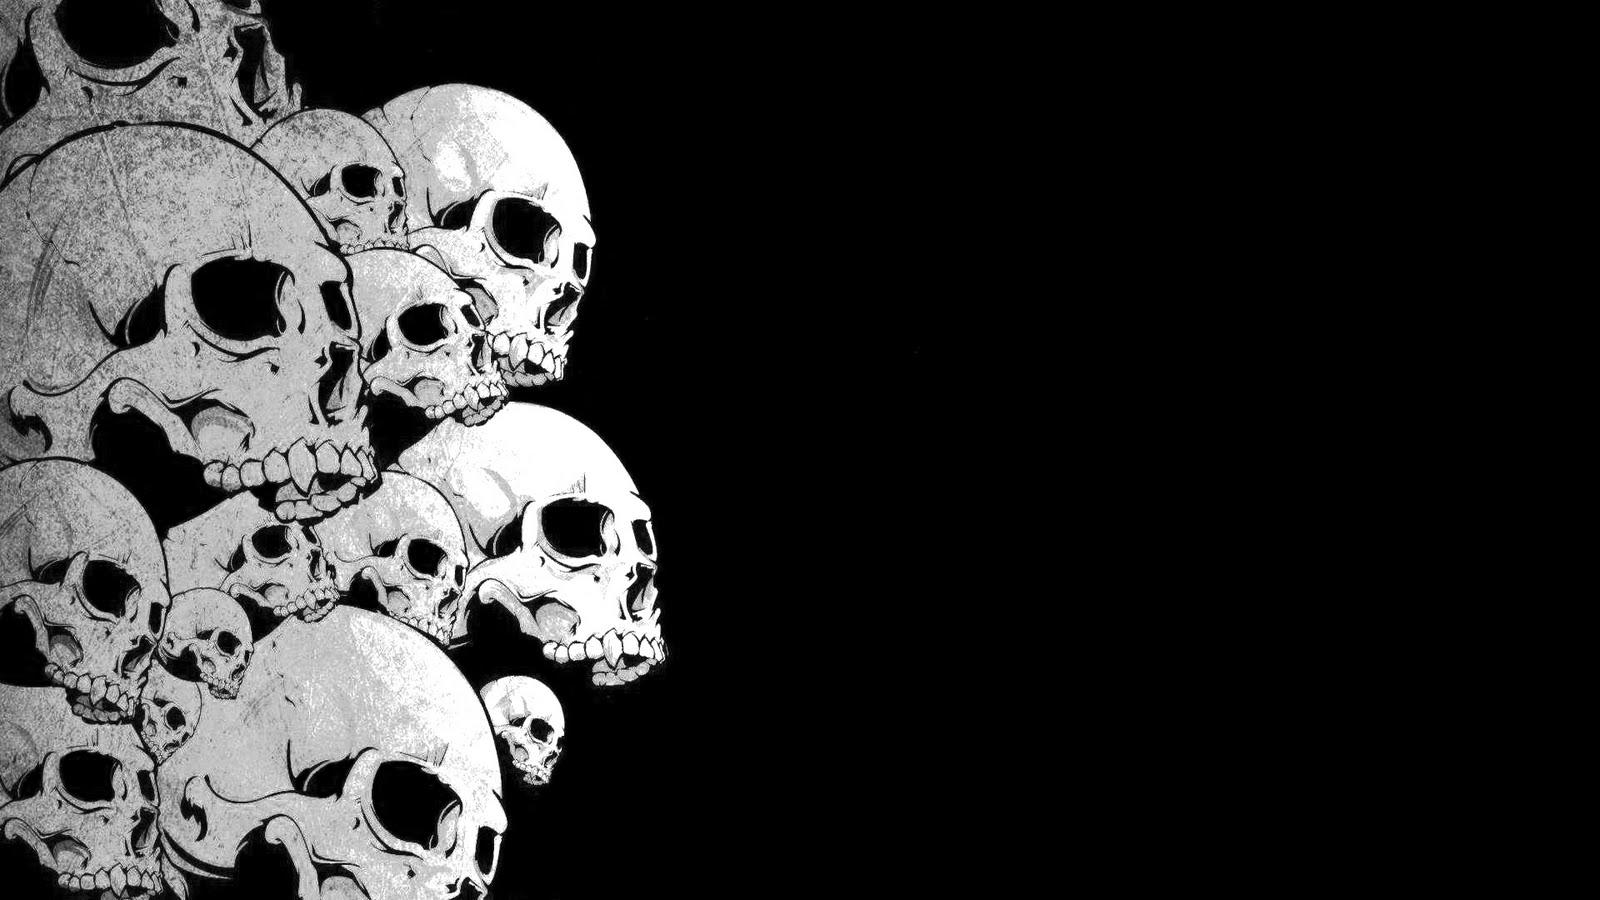 Black And White 1080p Wallpaper 24 Background Wallpaper